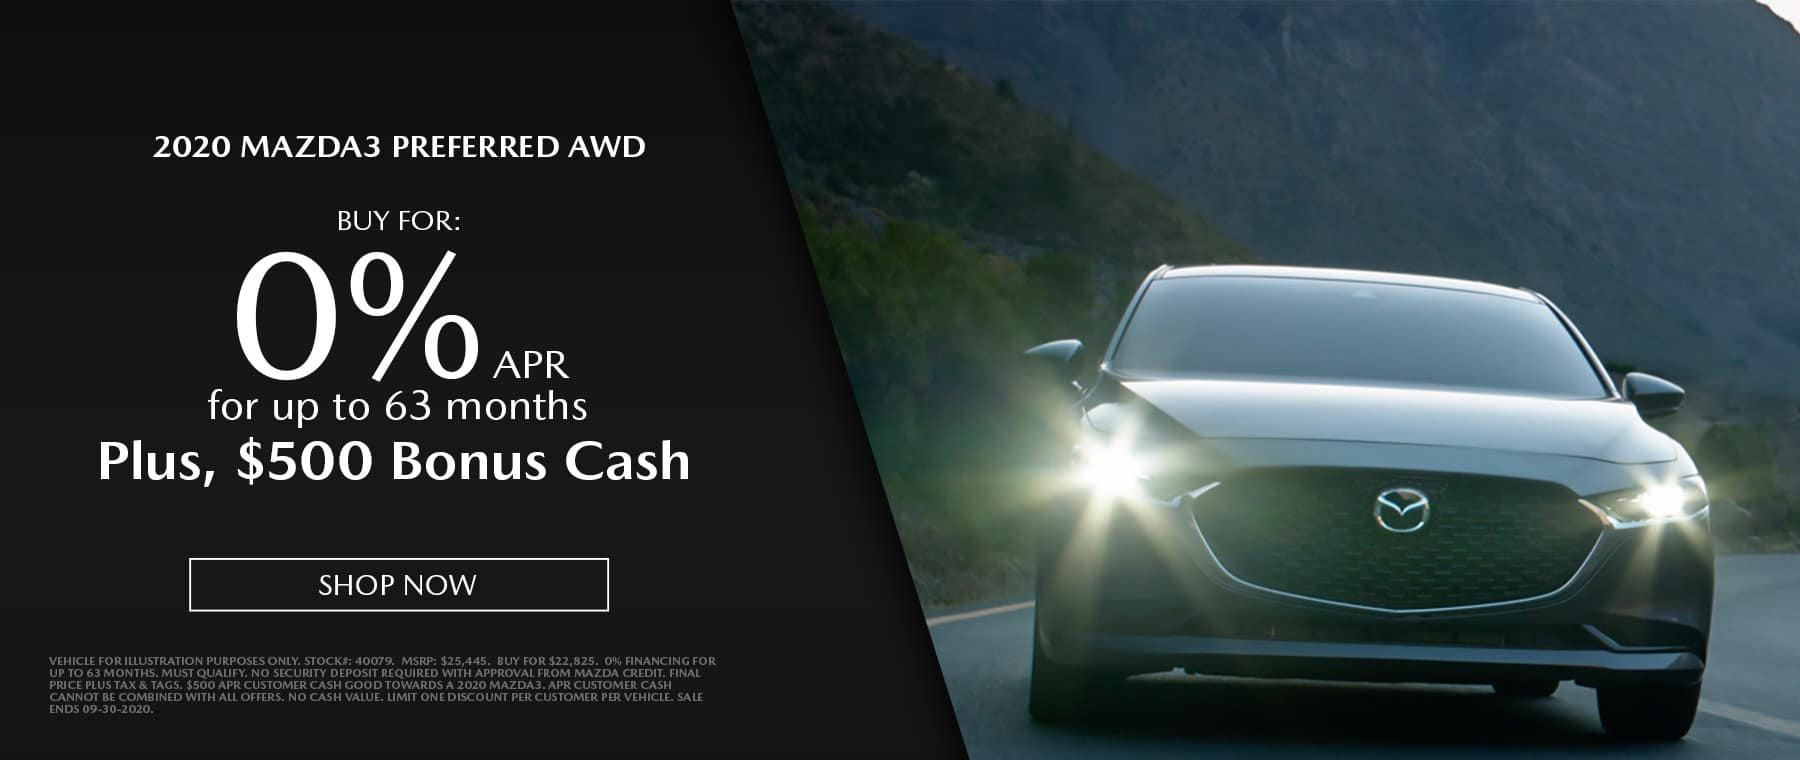 9_20_WV_Mazda_Web_Banners-2020-Mazda3